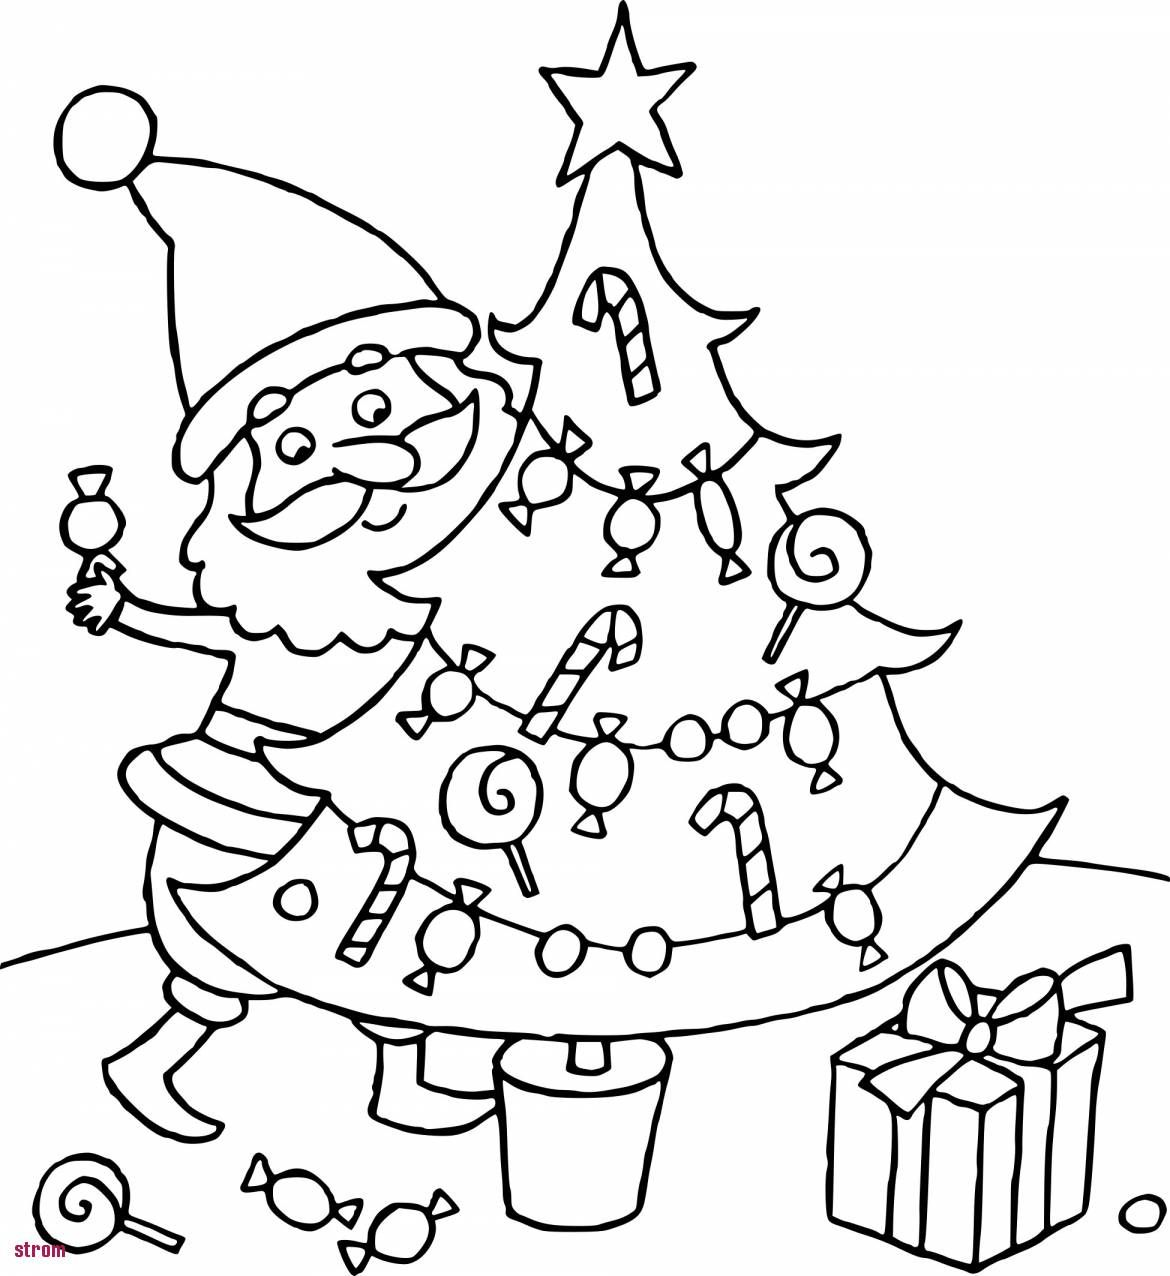 Coloriage Noel Sapin Luxe Concept Dessin A Imprimer Sapin De Noel In Tendances Coloriage Noel Sapin Lu Coloriage Noel A Imprimer Coloriage Sapin Coloriage Noel